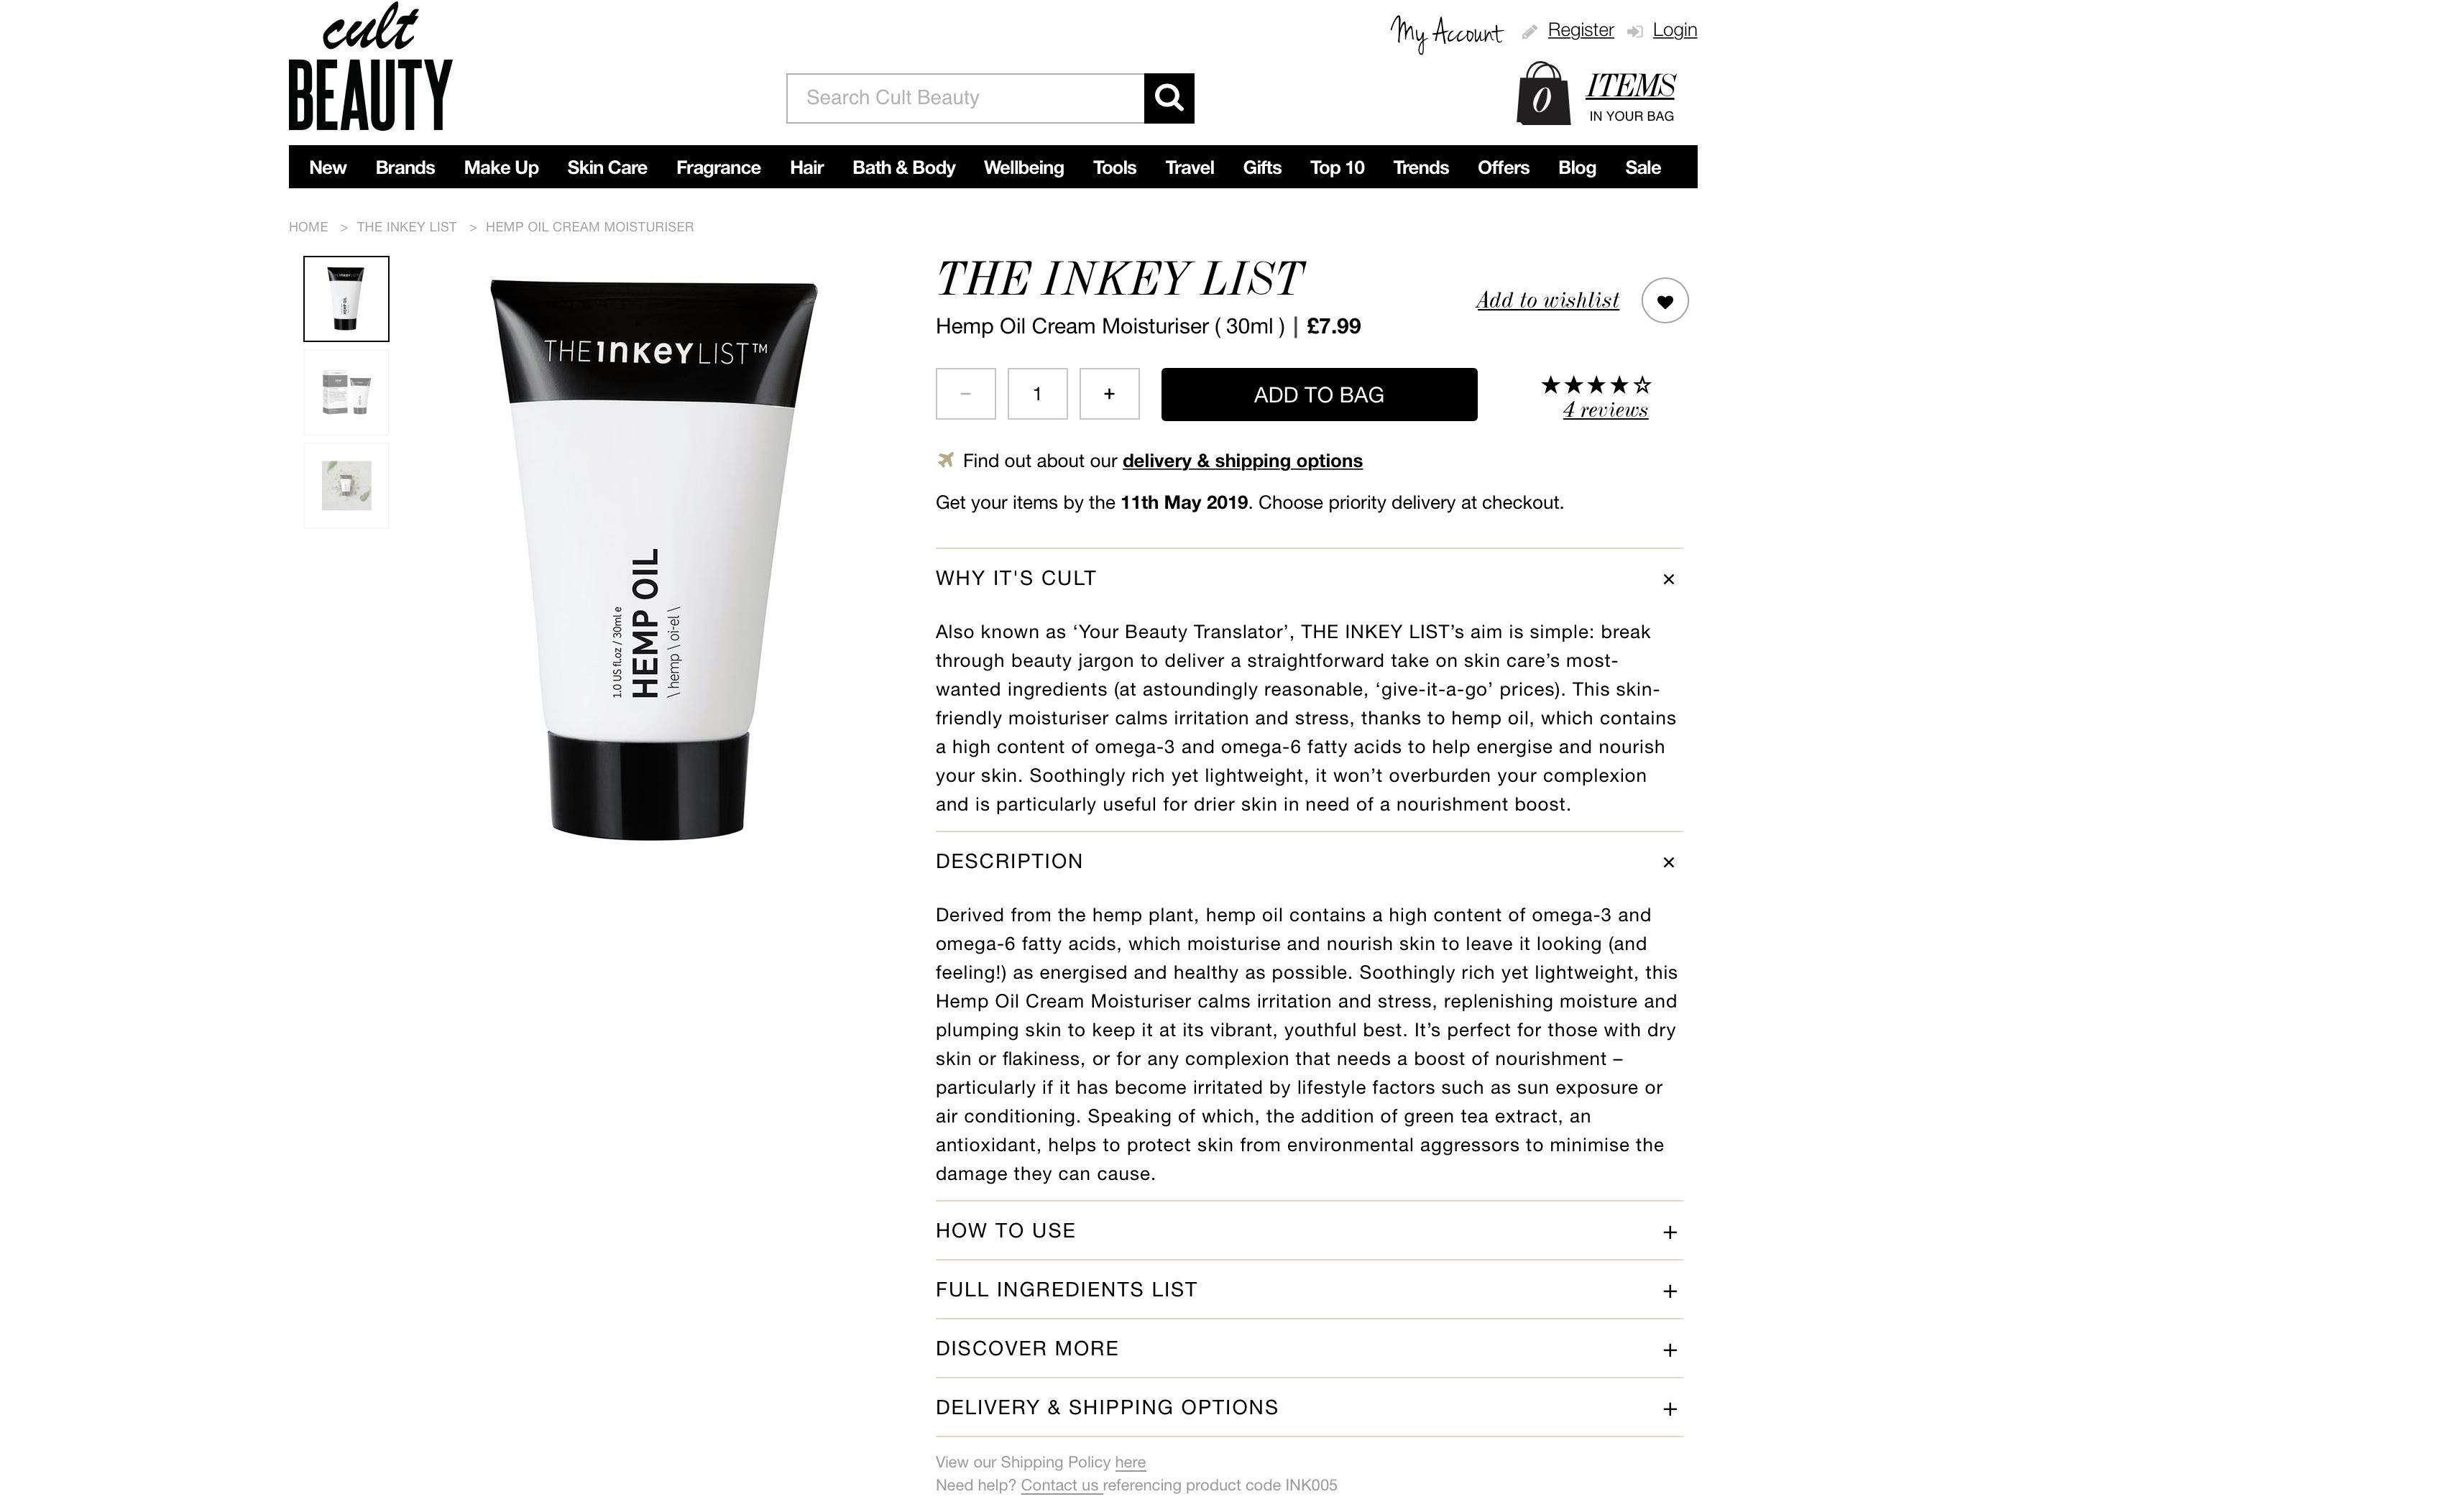 The Inkey List Hemp Oil Cream Moisturizer